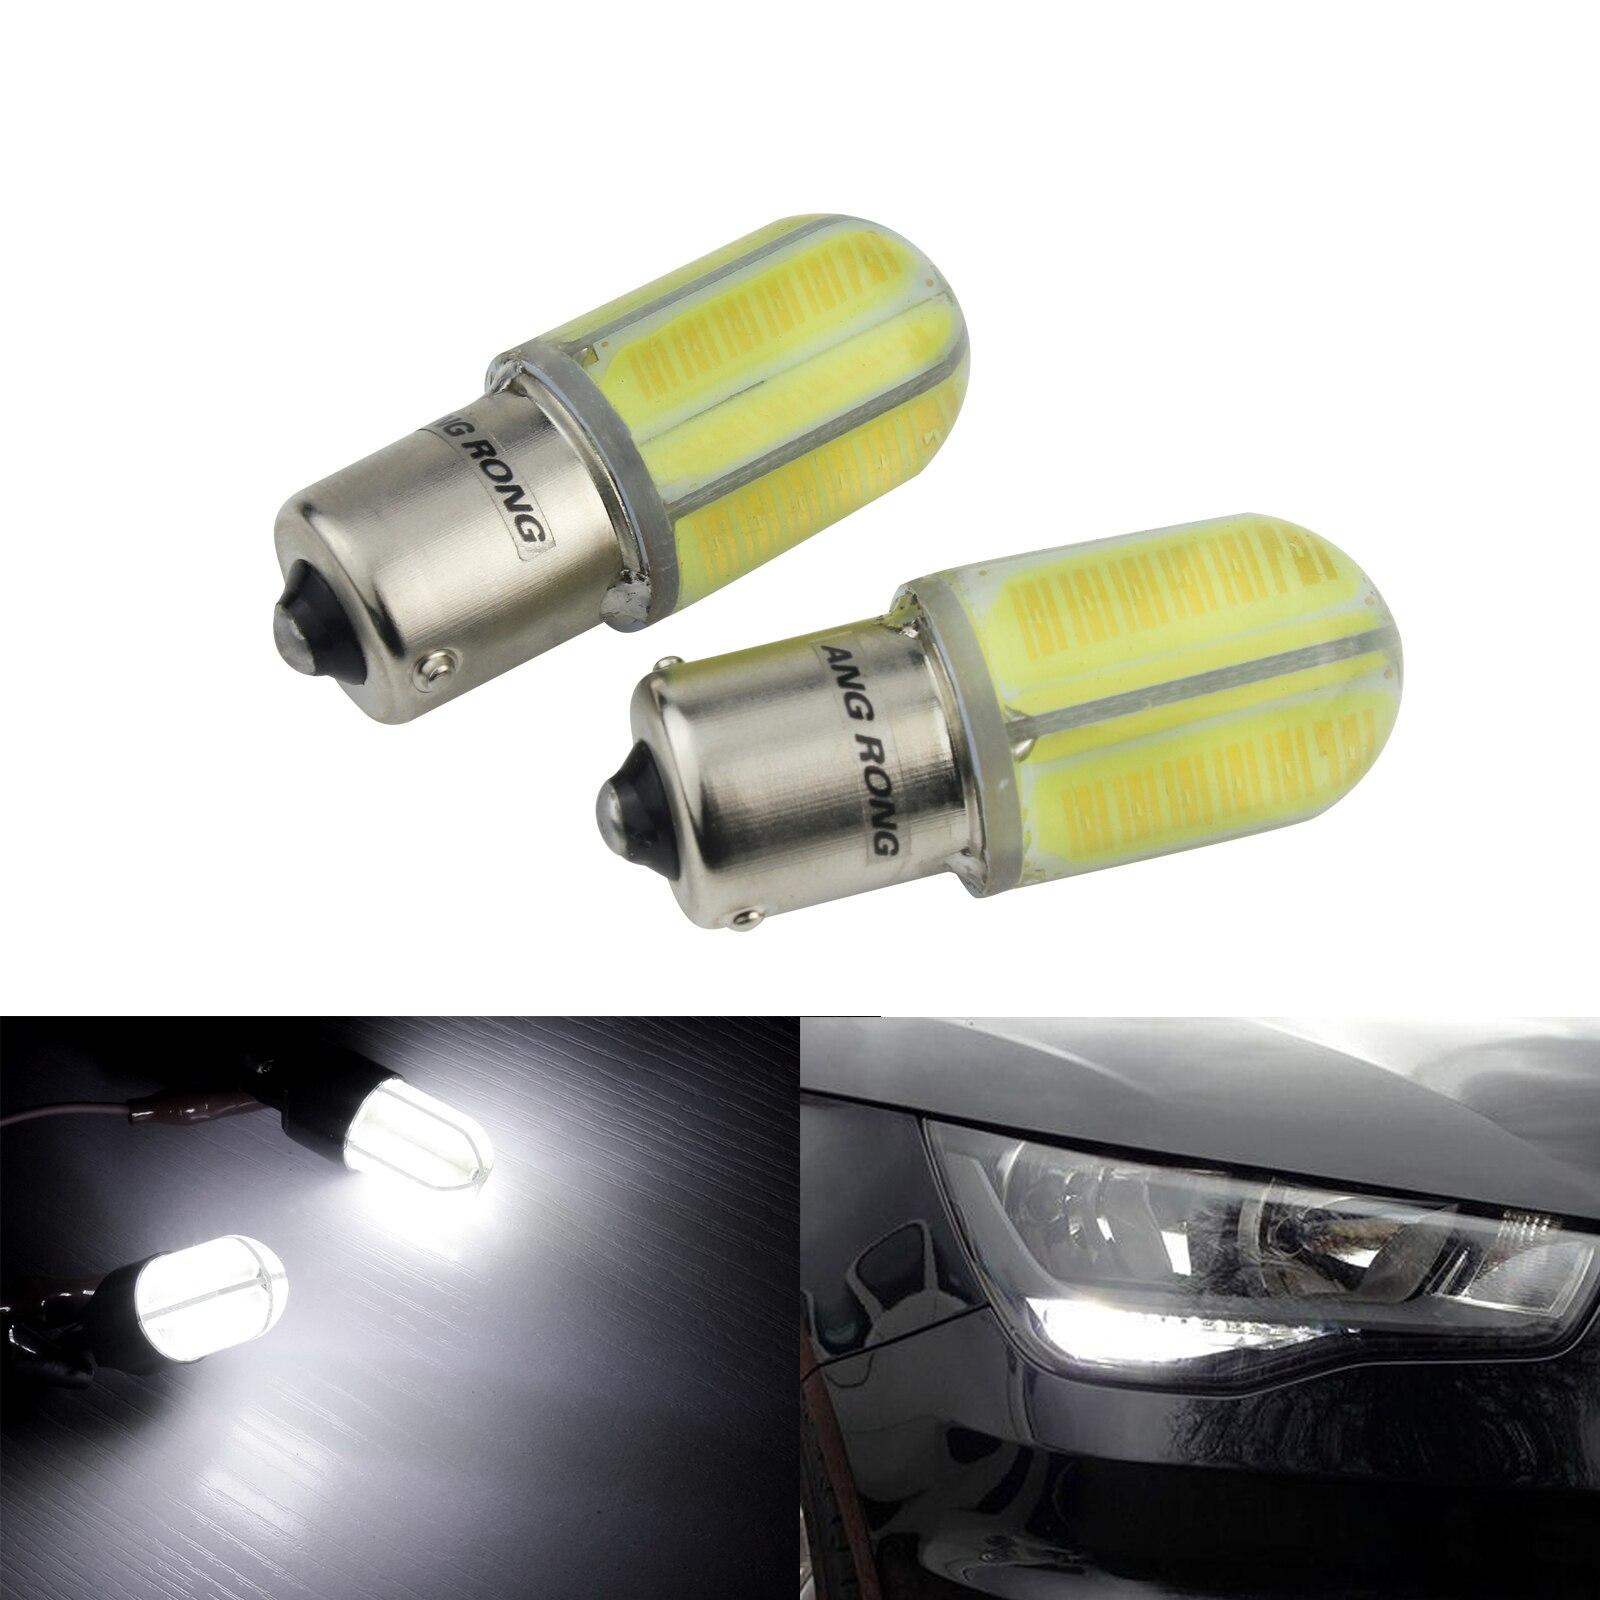 2x Fits BMW 3 Series E30 Genuine Osram Ultra Life Tail Light Bulbs